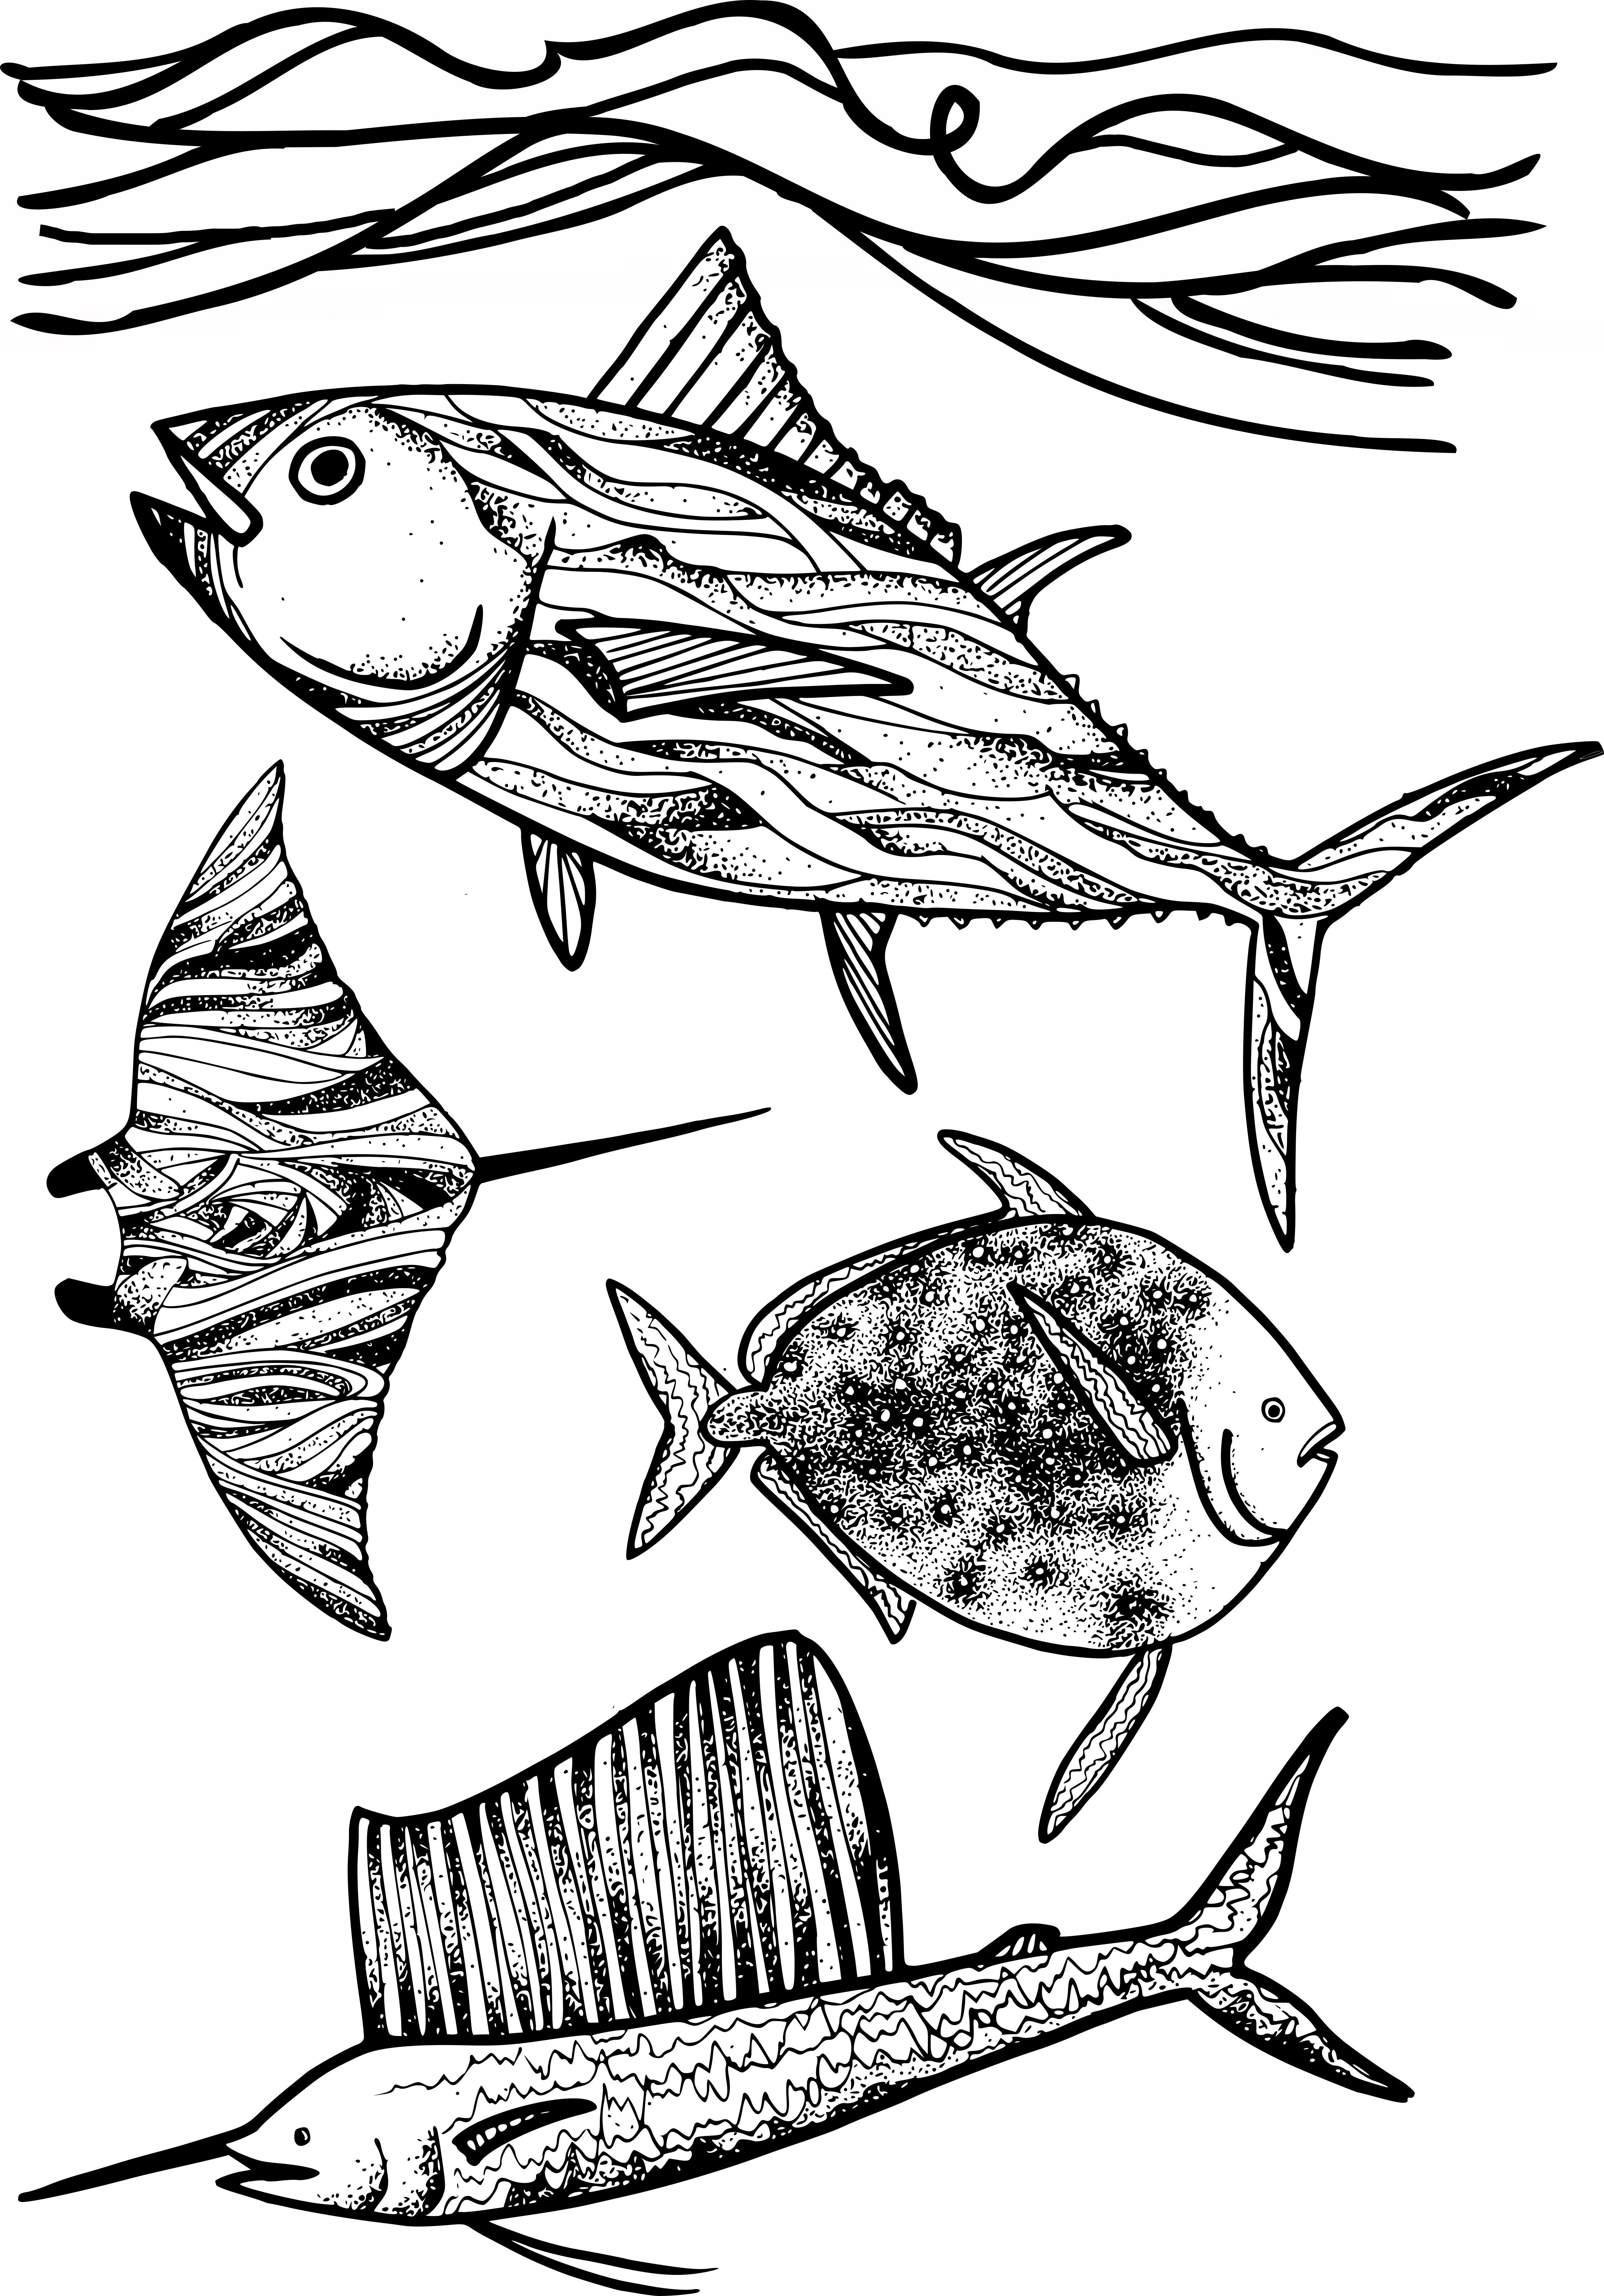 Tuna conference